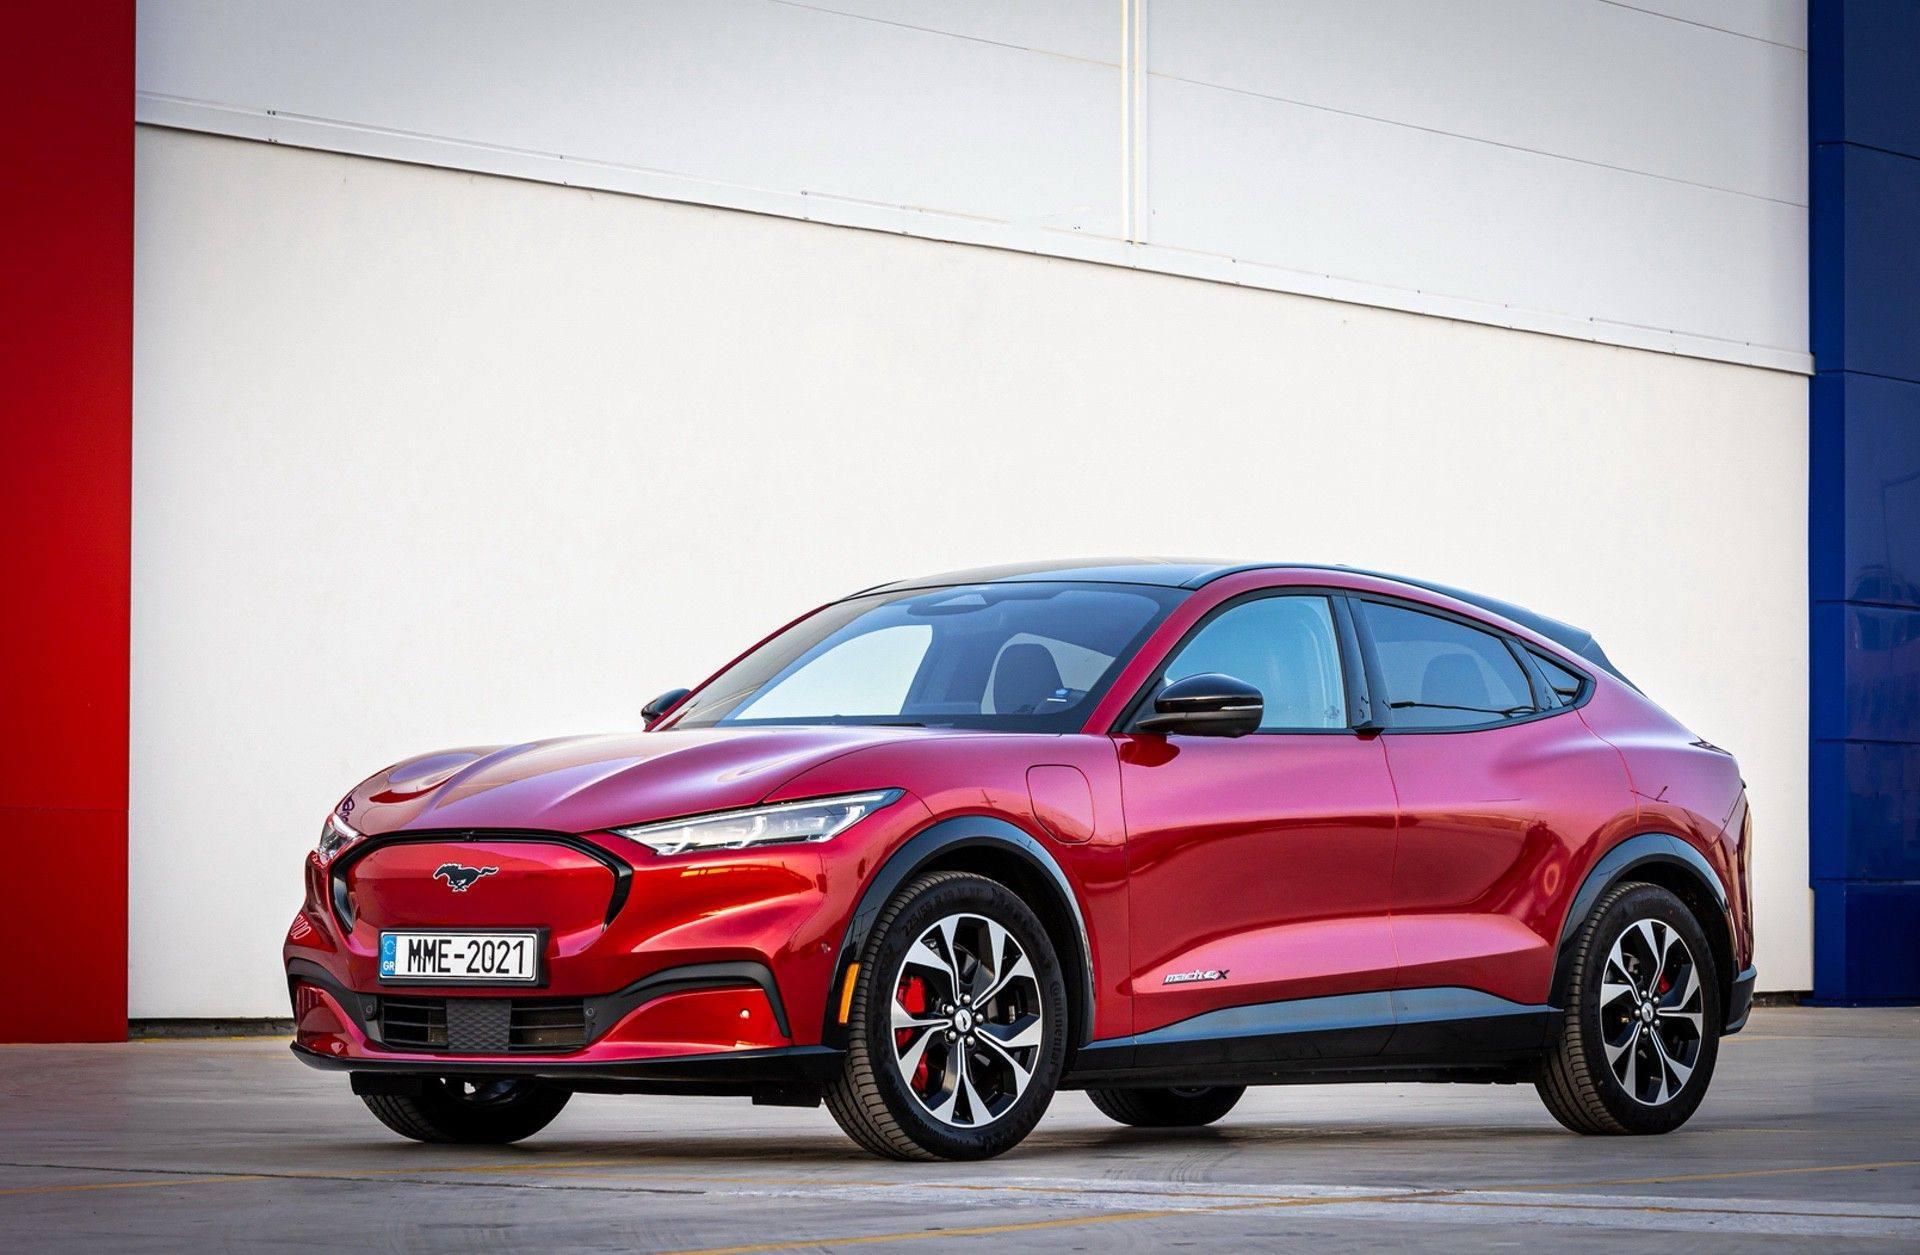 Ford_Mustang_Mach-E_greek_presskit-0016